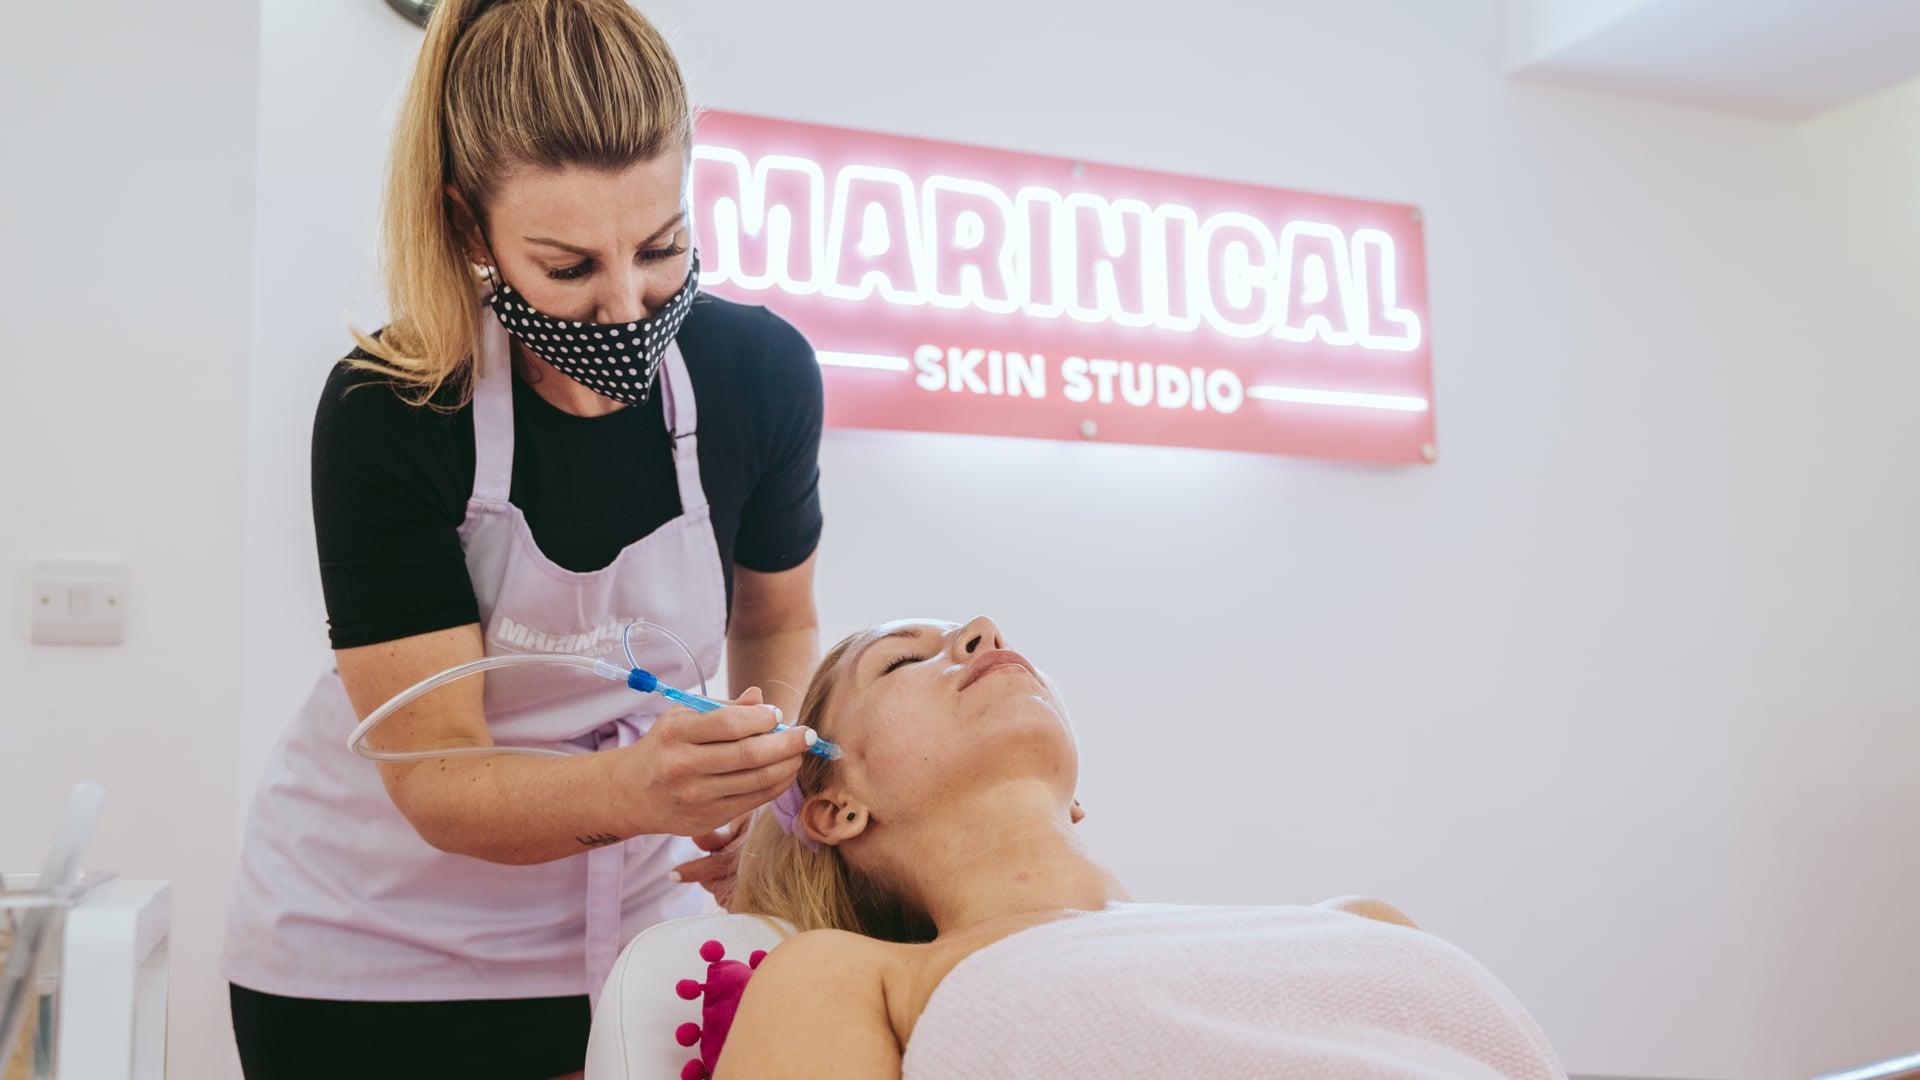 Marinical Skin Cocktail Studio